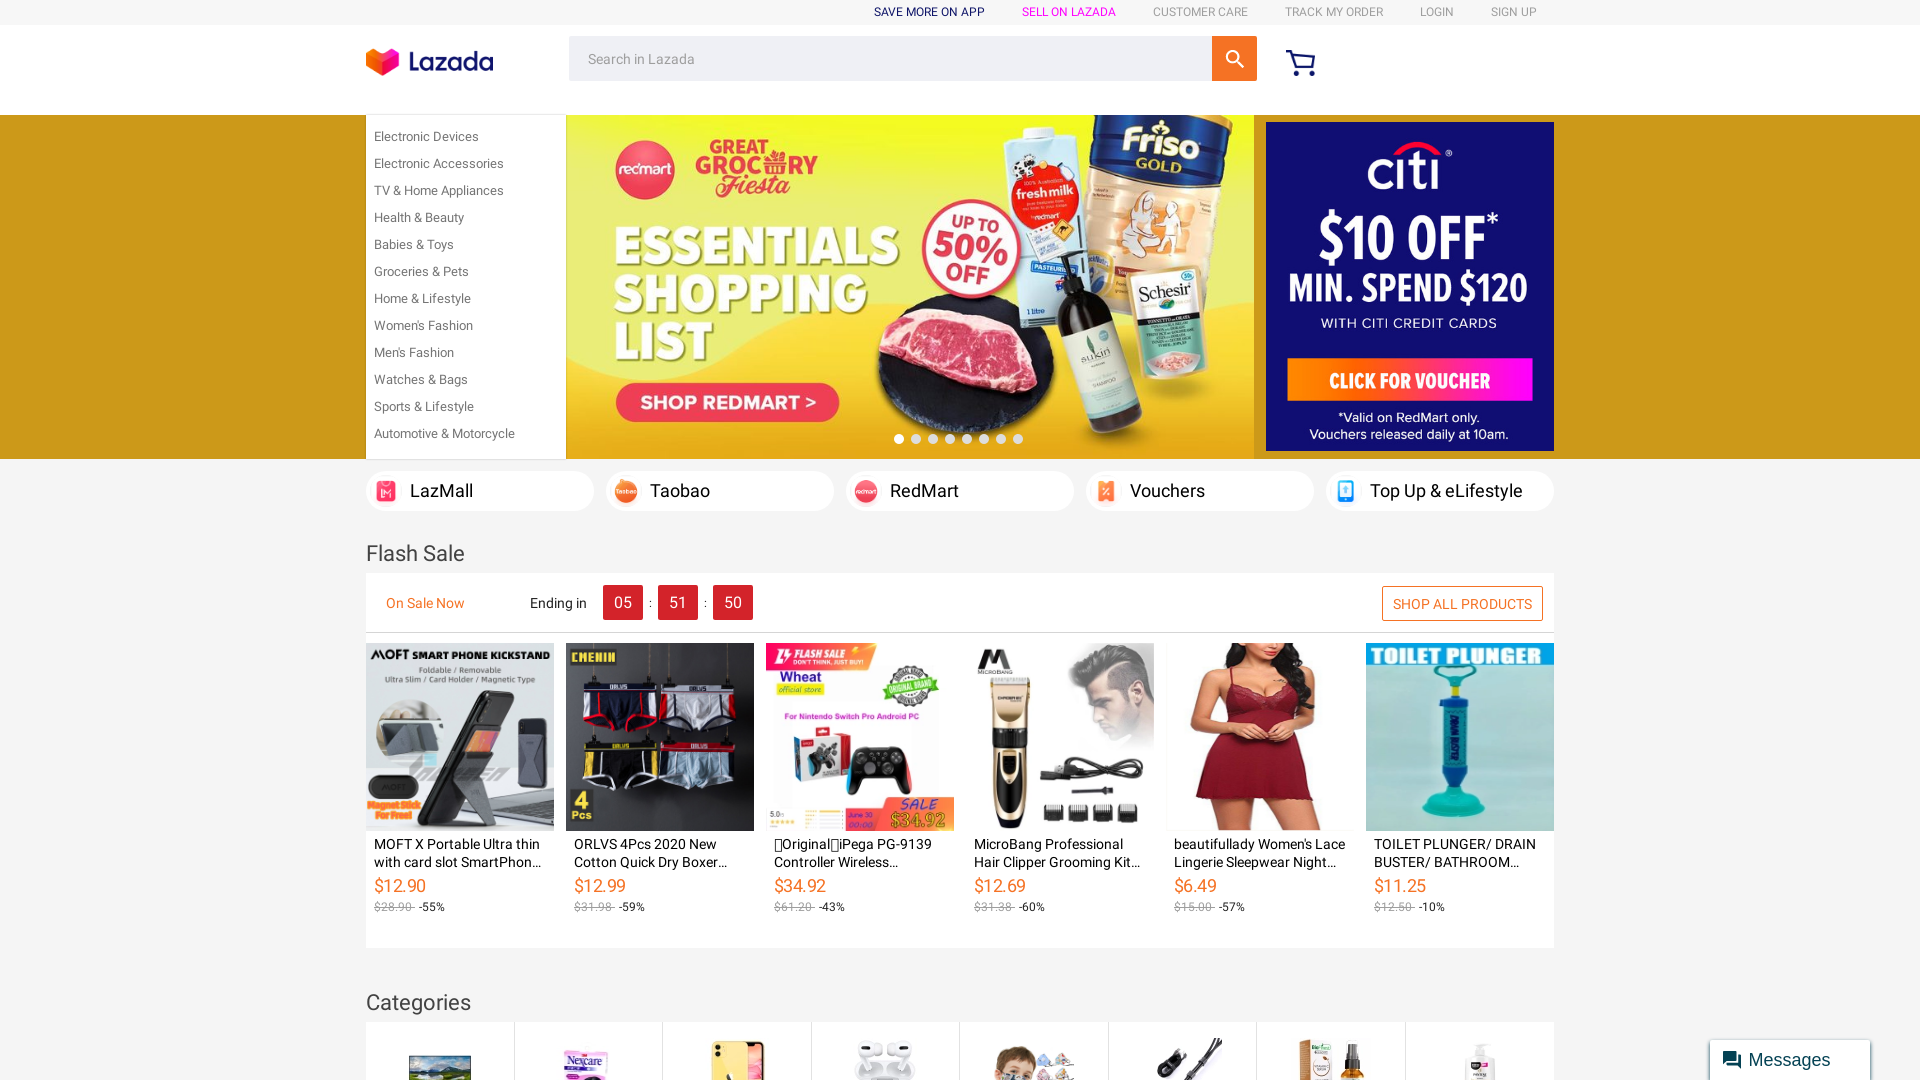 Lazada Singapore website